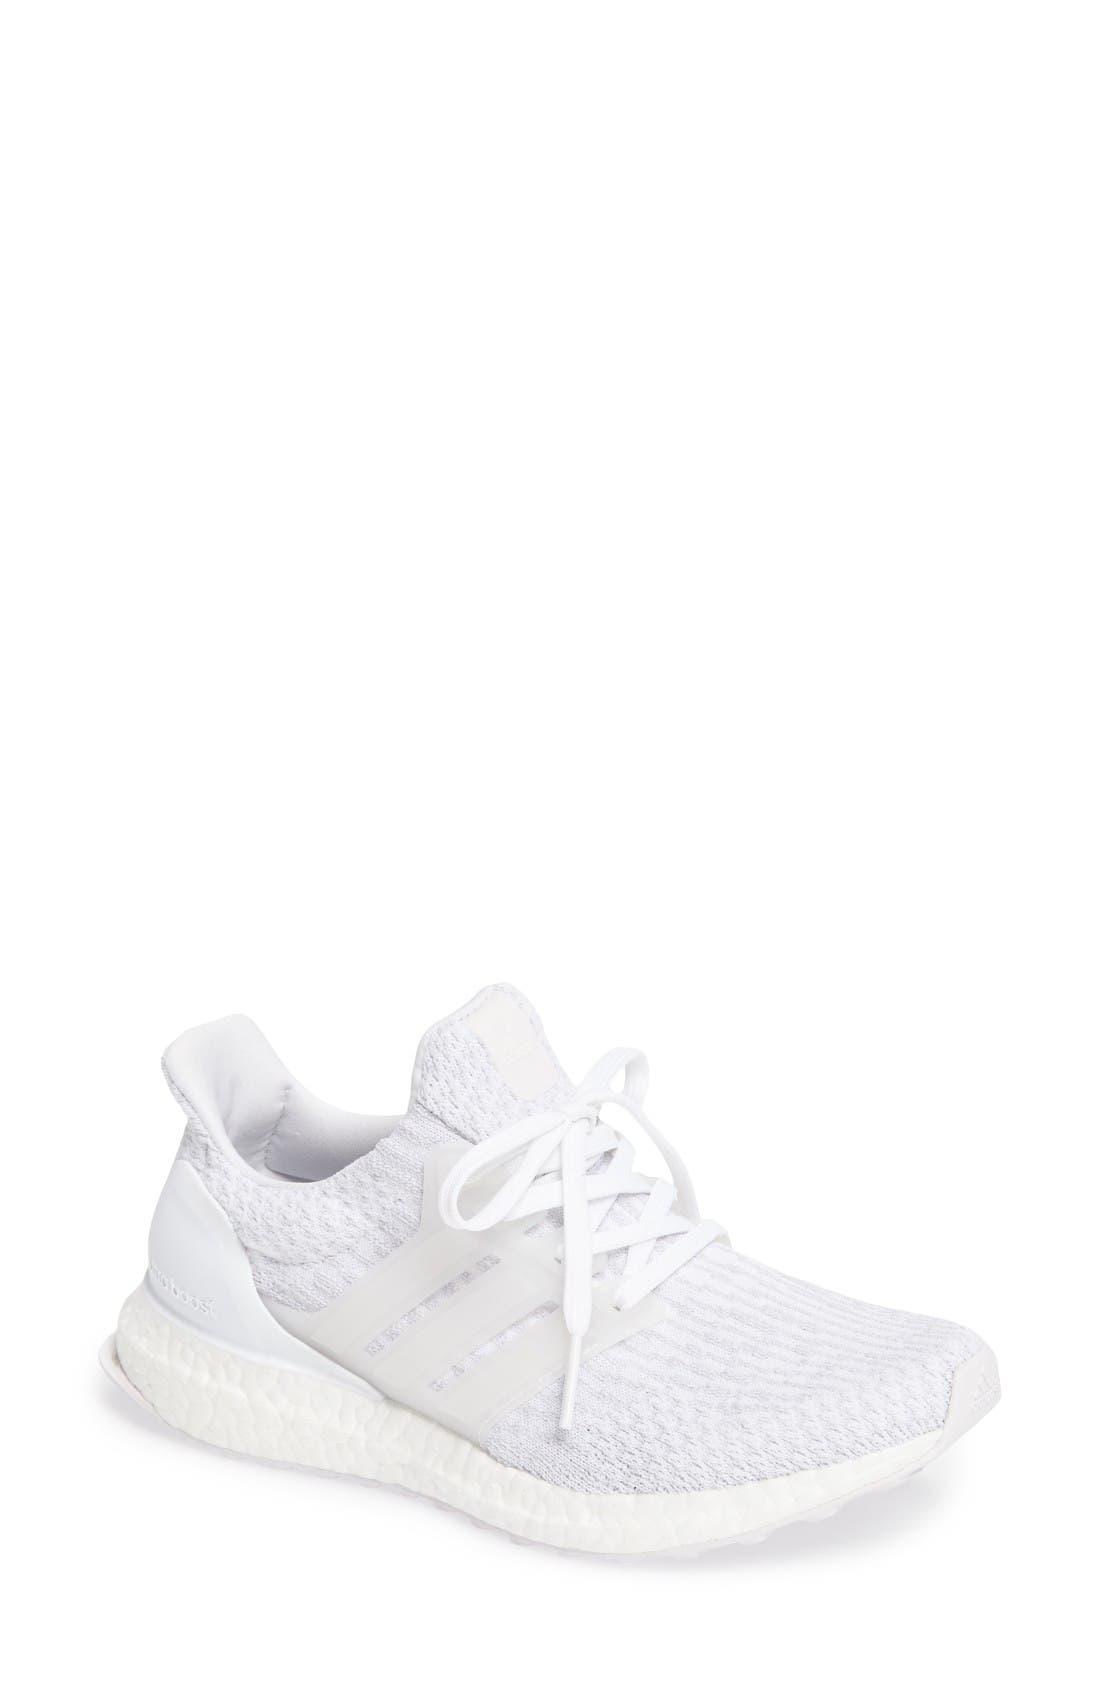 Main Image - adidas \u0027UltraBoost\u0027 Running Shoe (Women)